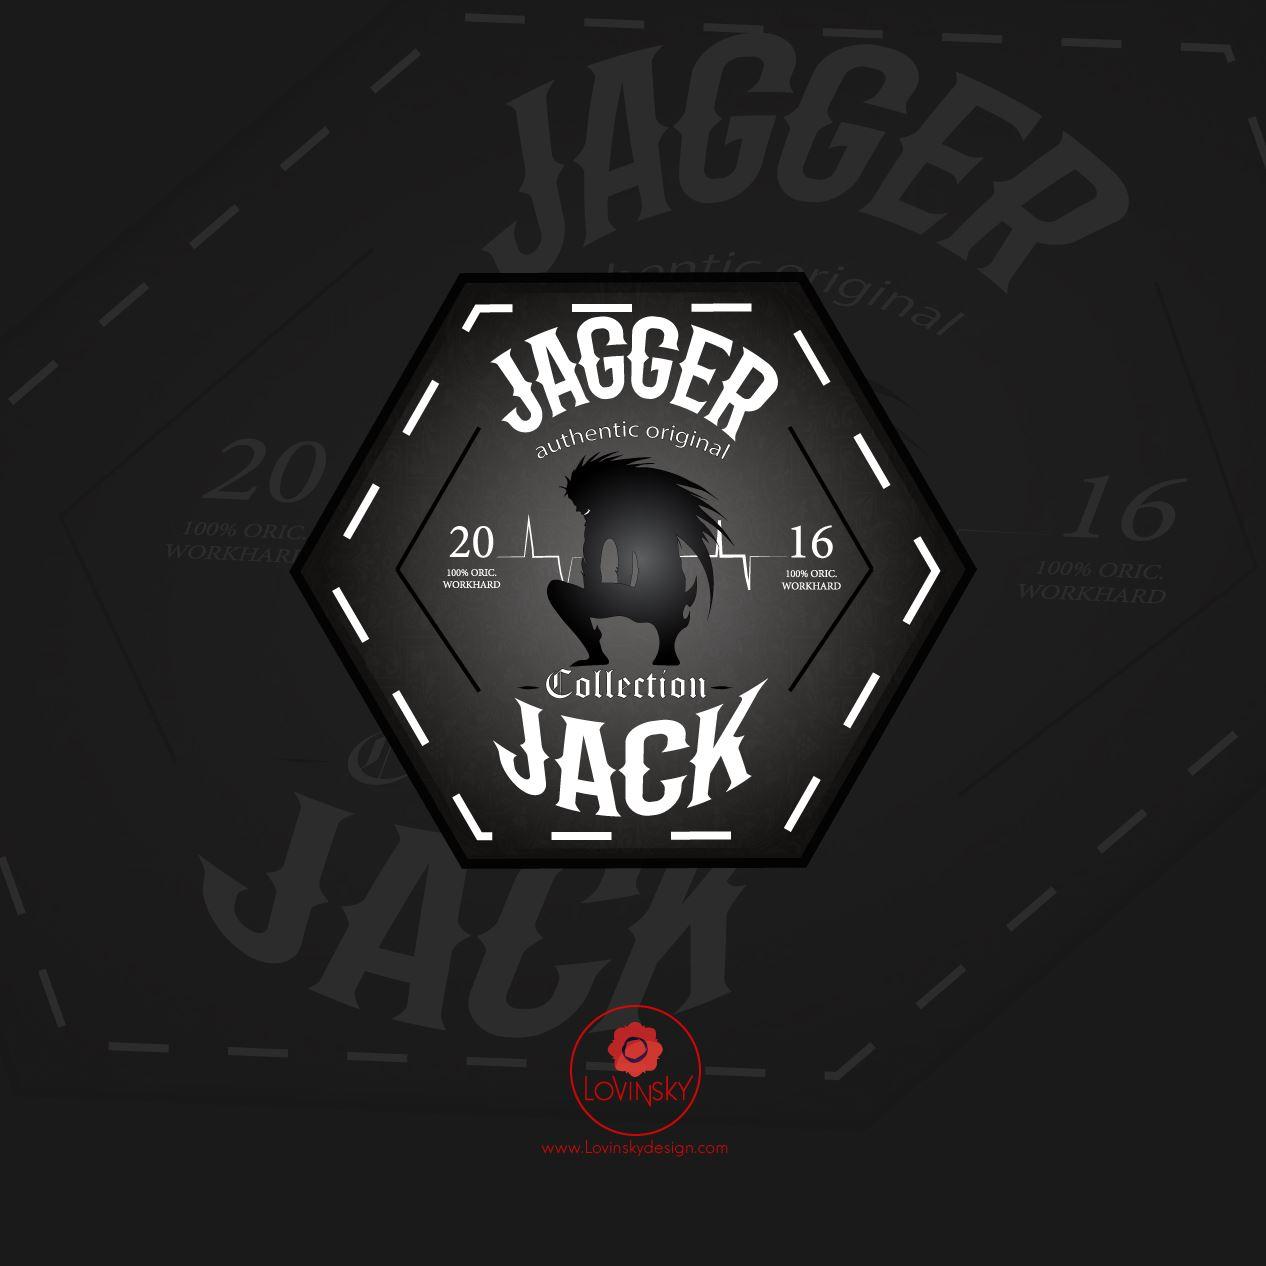 jagger-jack-logo lovinsky graphiste webdesigner freelance nantes 44